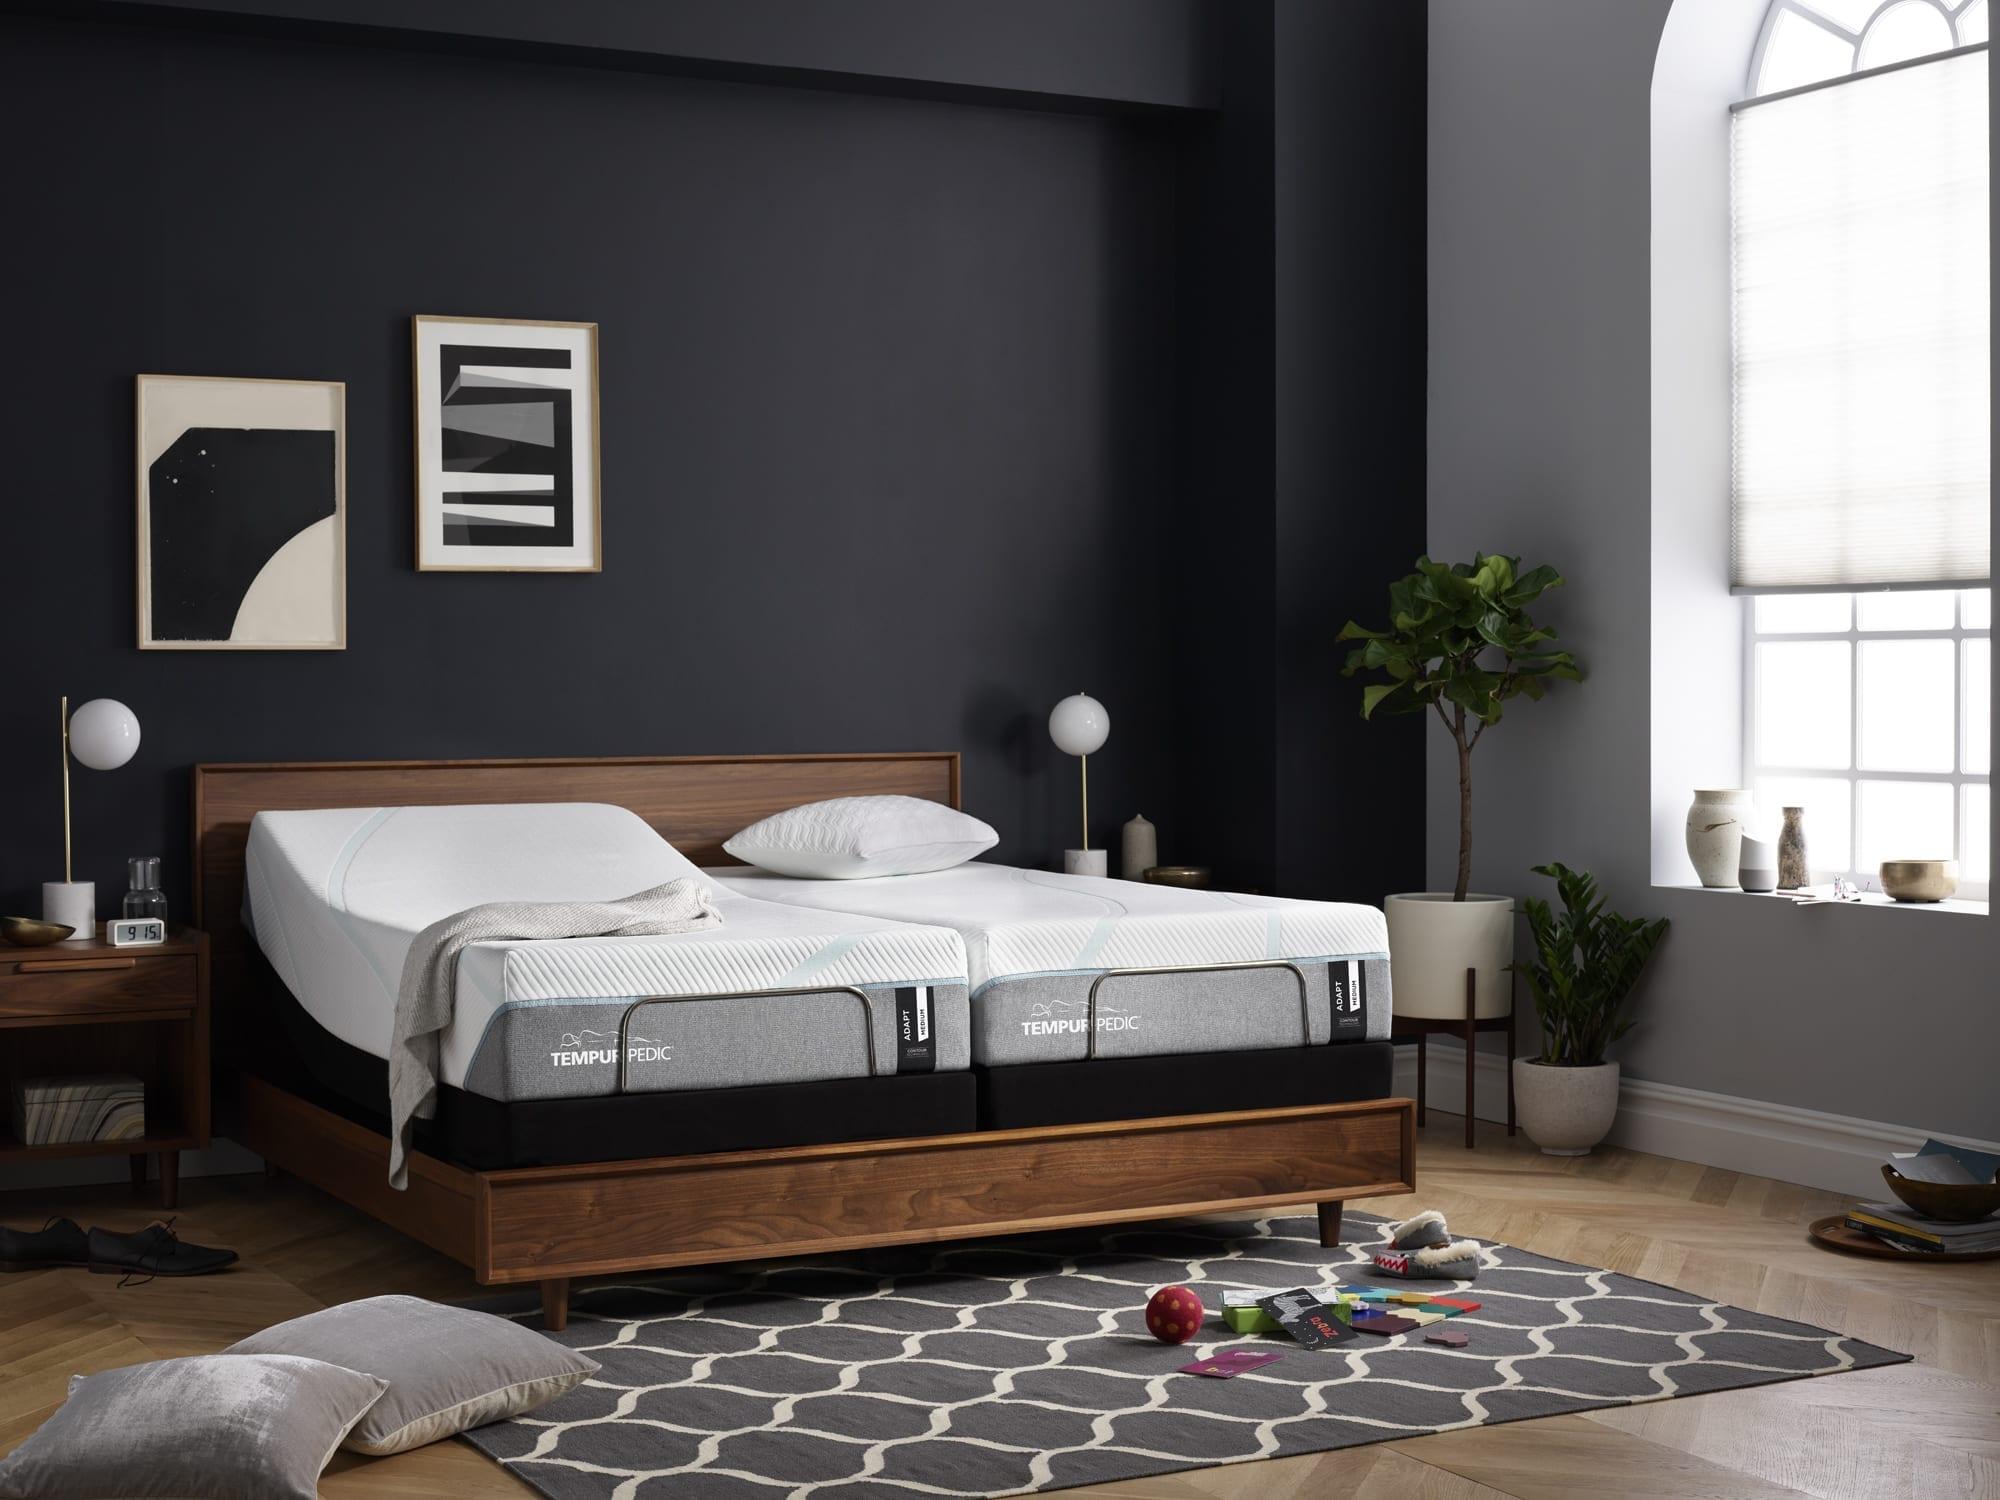 TEMPUR-Adapt® Series Medium Hybrid mattress